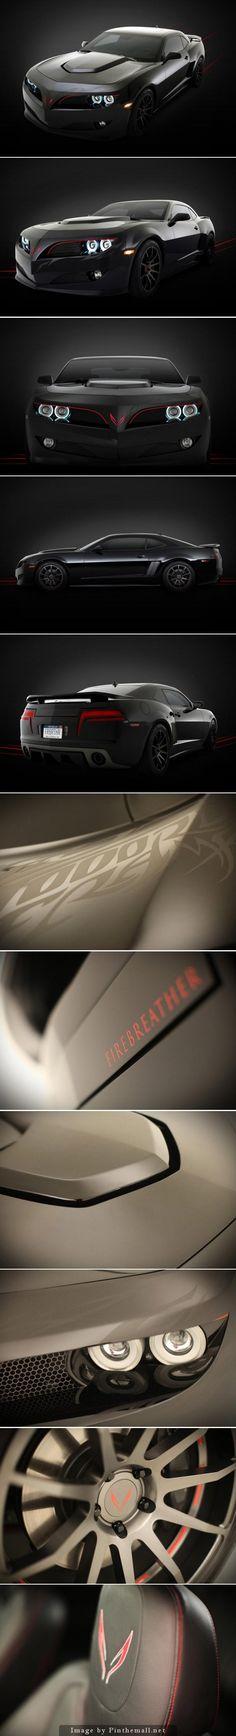 2010 Chevrolet Camaro Signature Series FireBreather